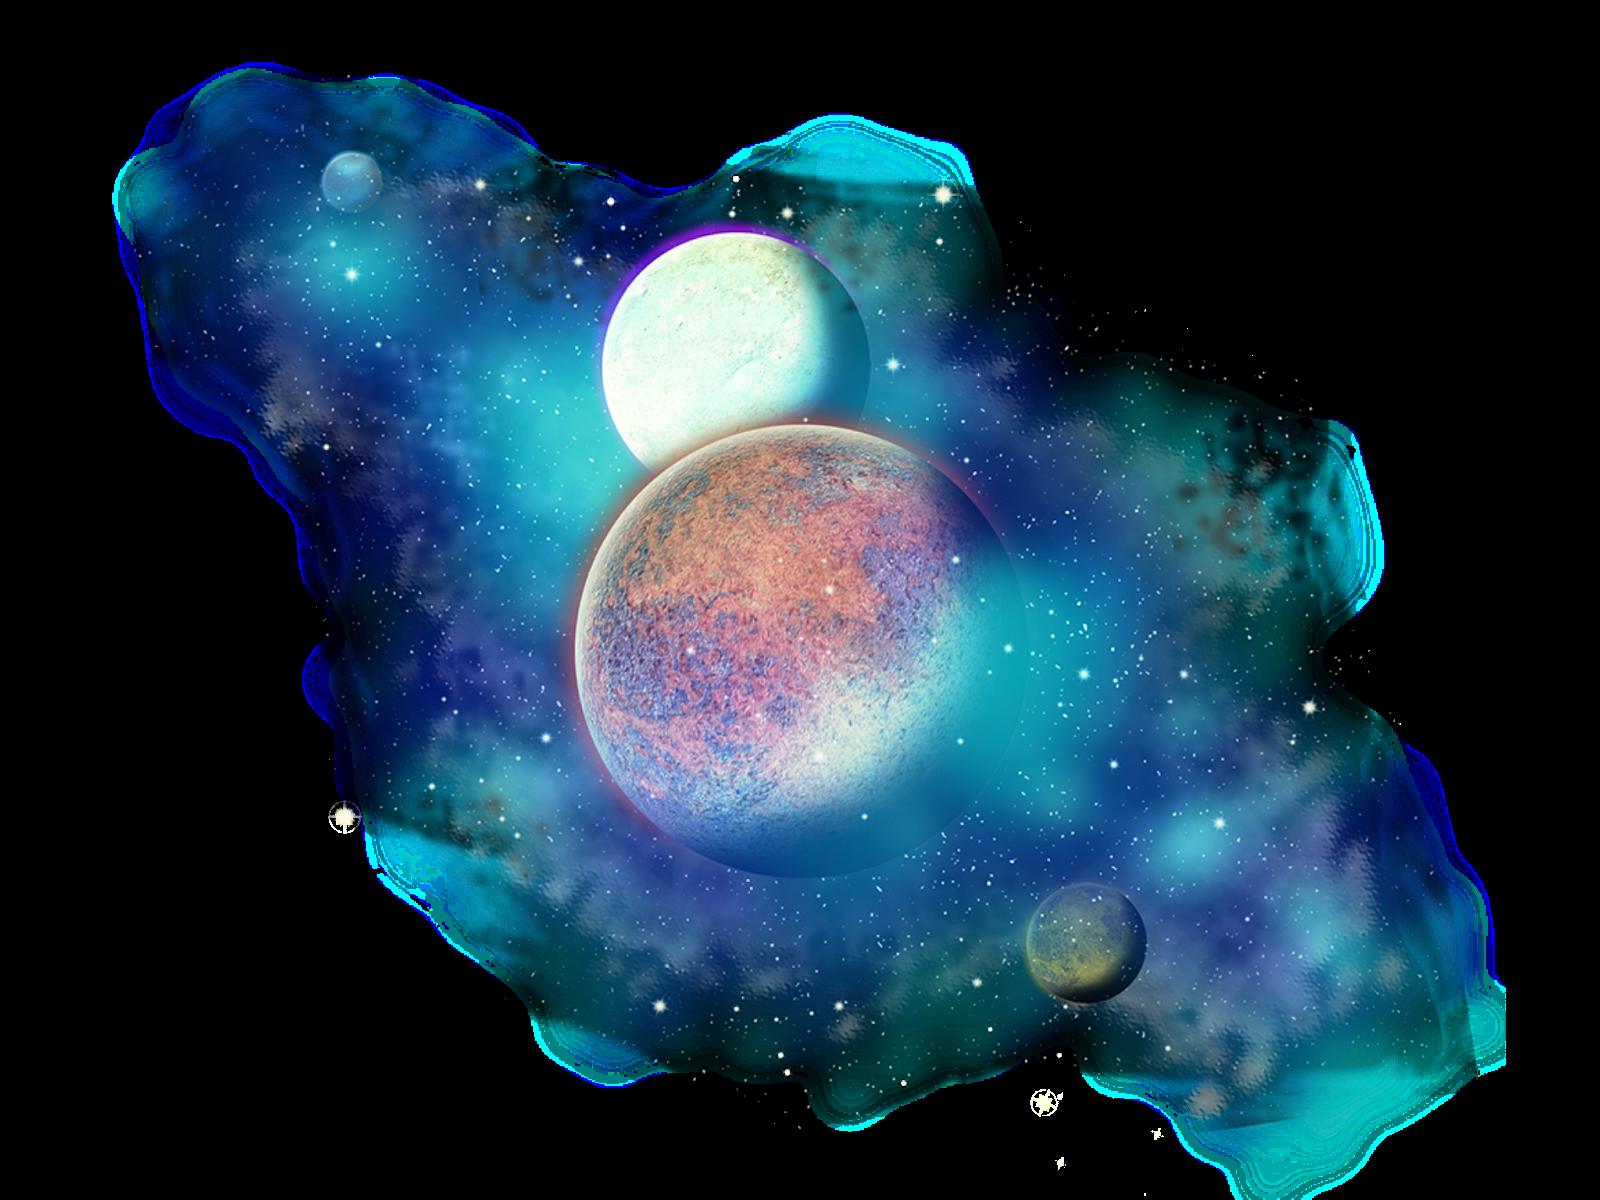 star space transparent - HD1600×1200